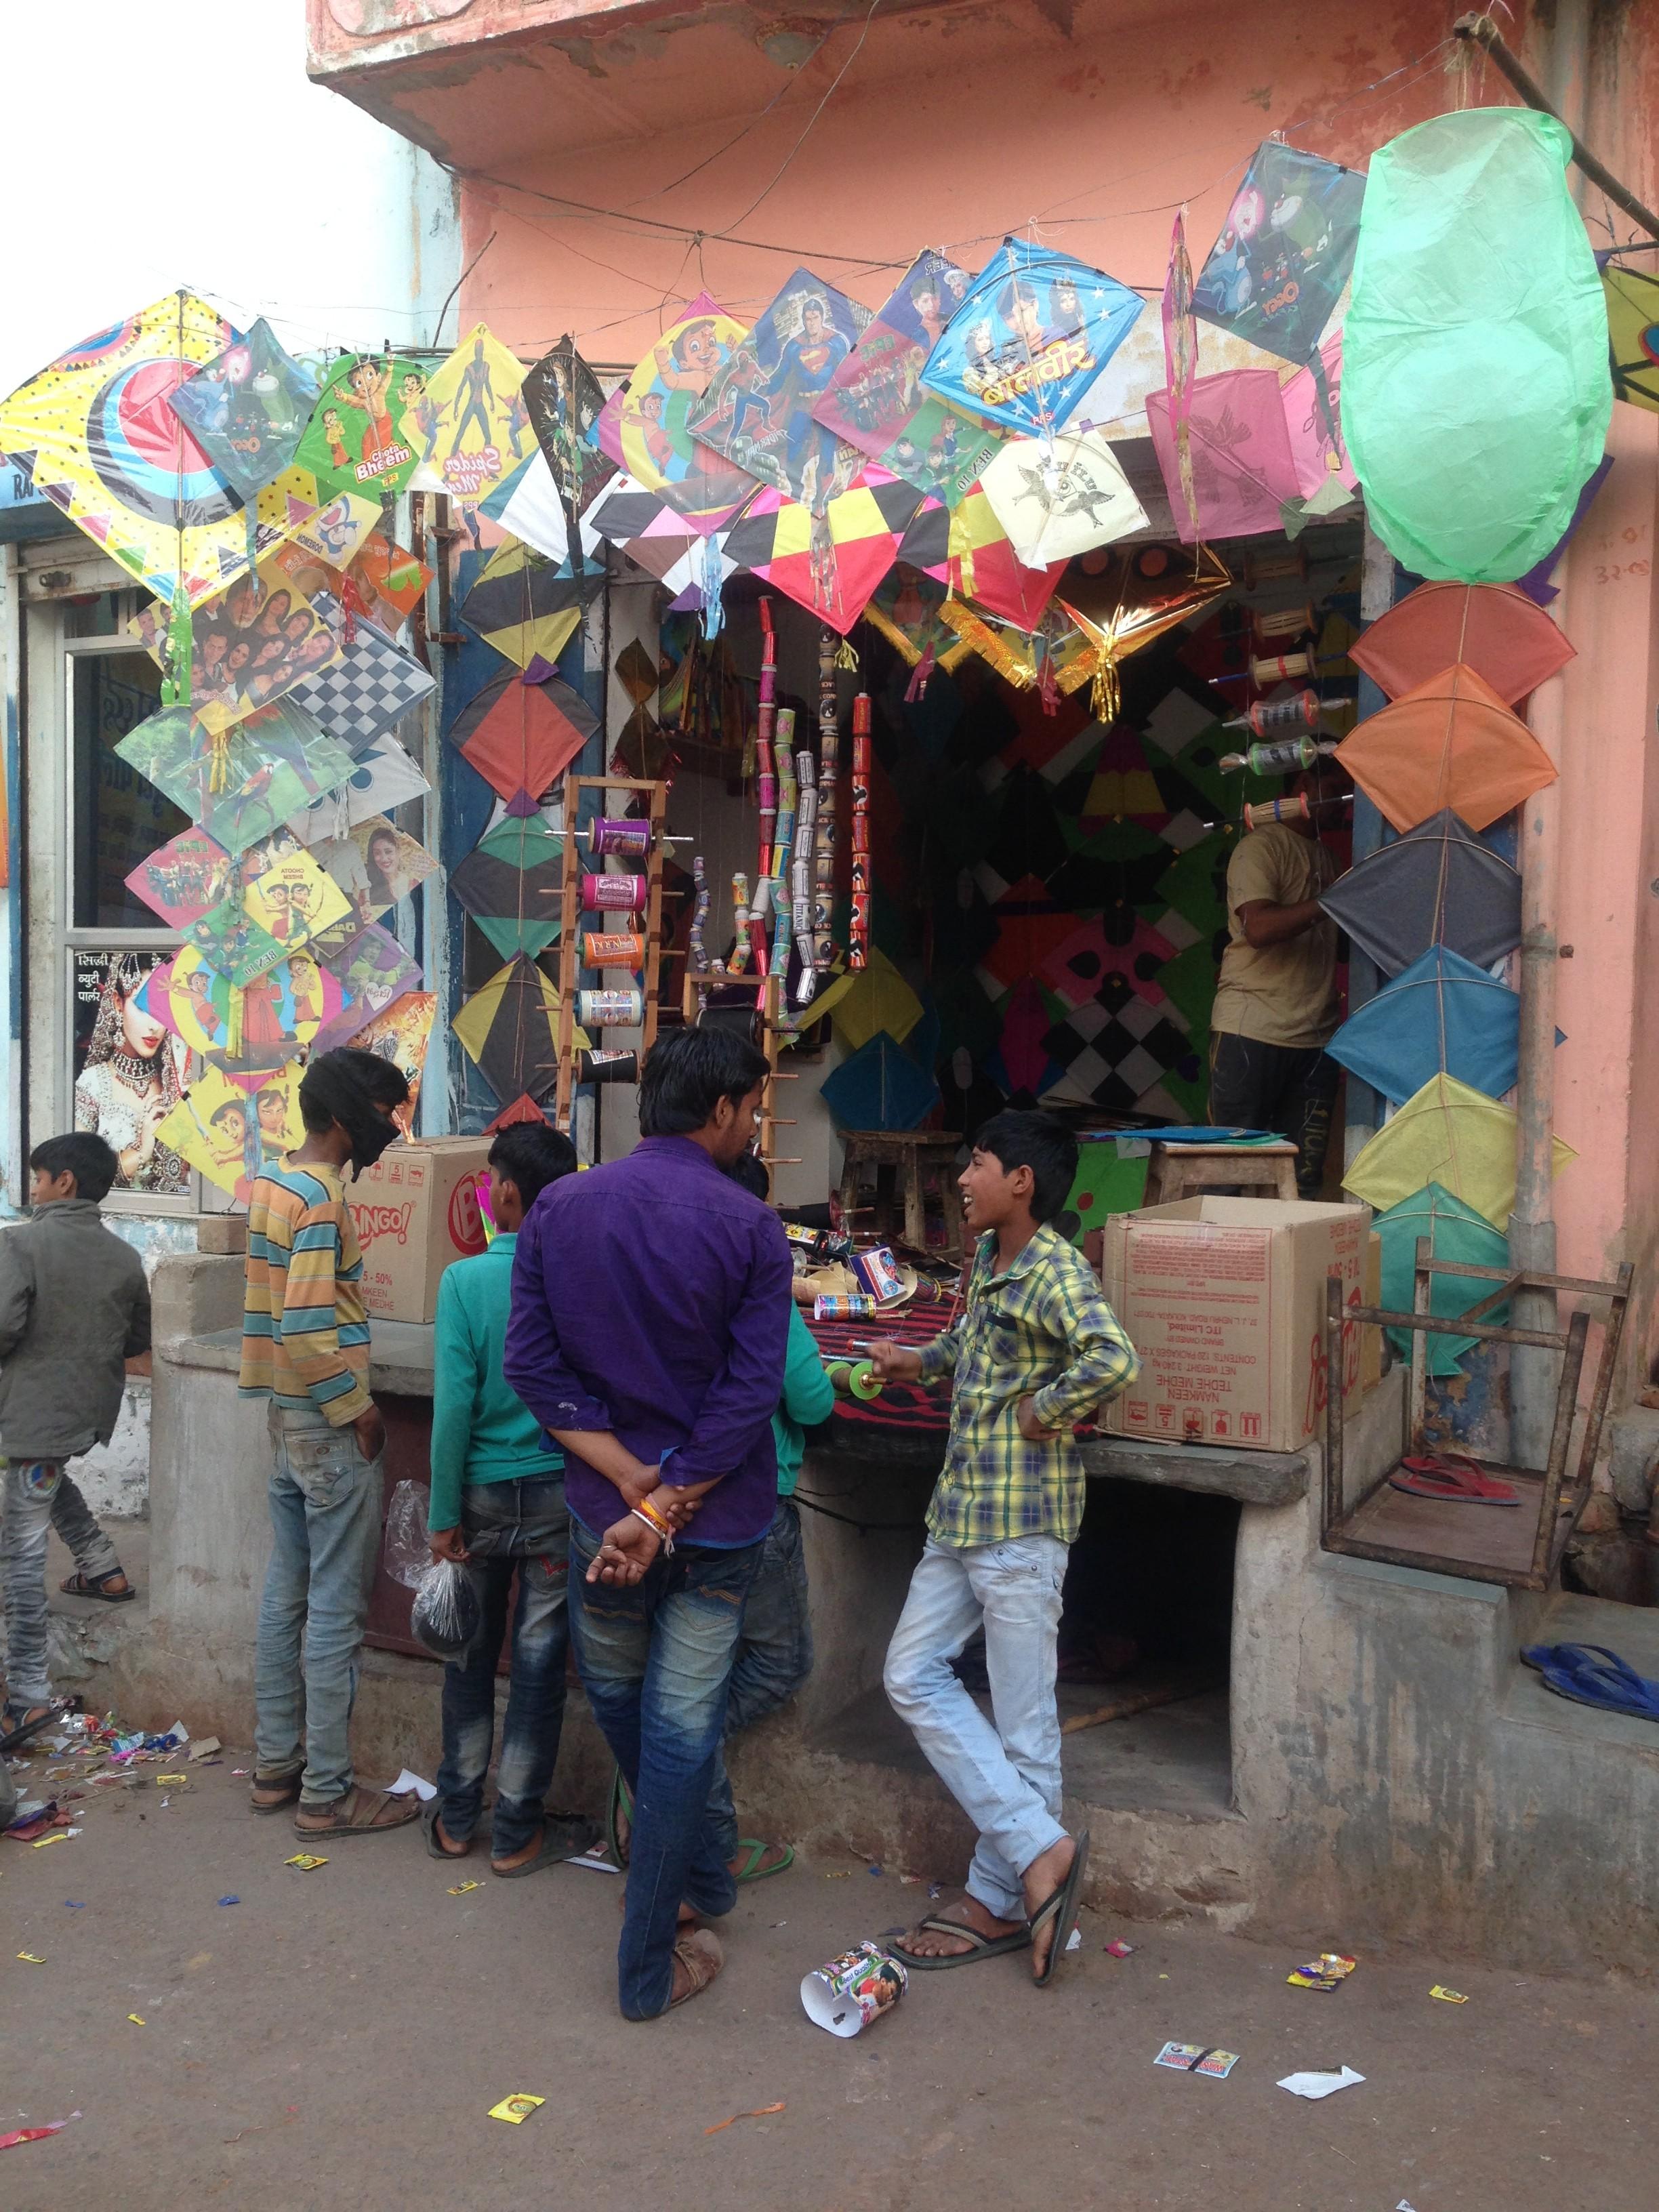 Kite festival India local kite shop